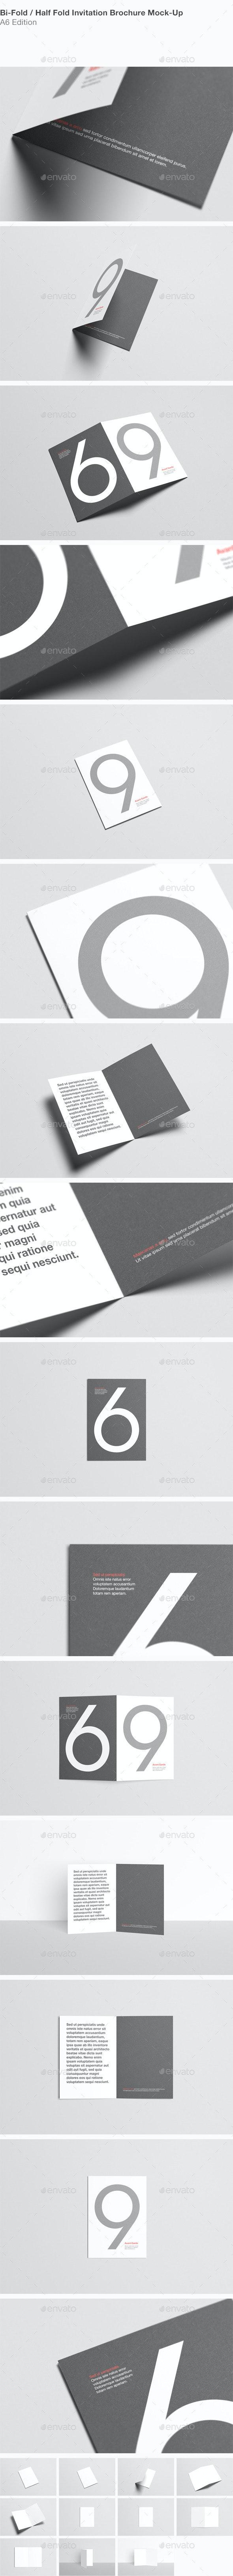 A6 Bi-Fold / Half-Fold Invitation Brochure Mock-Up - Brochures Print